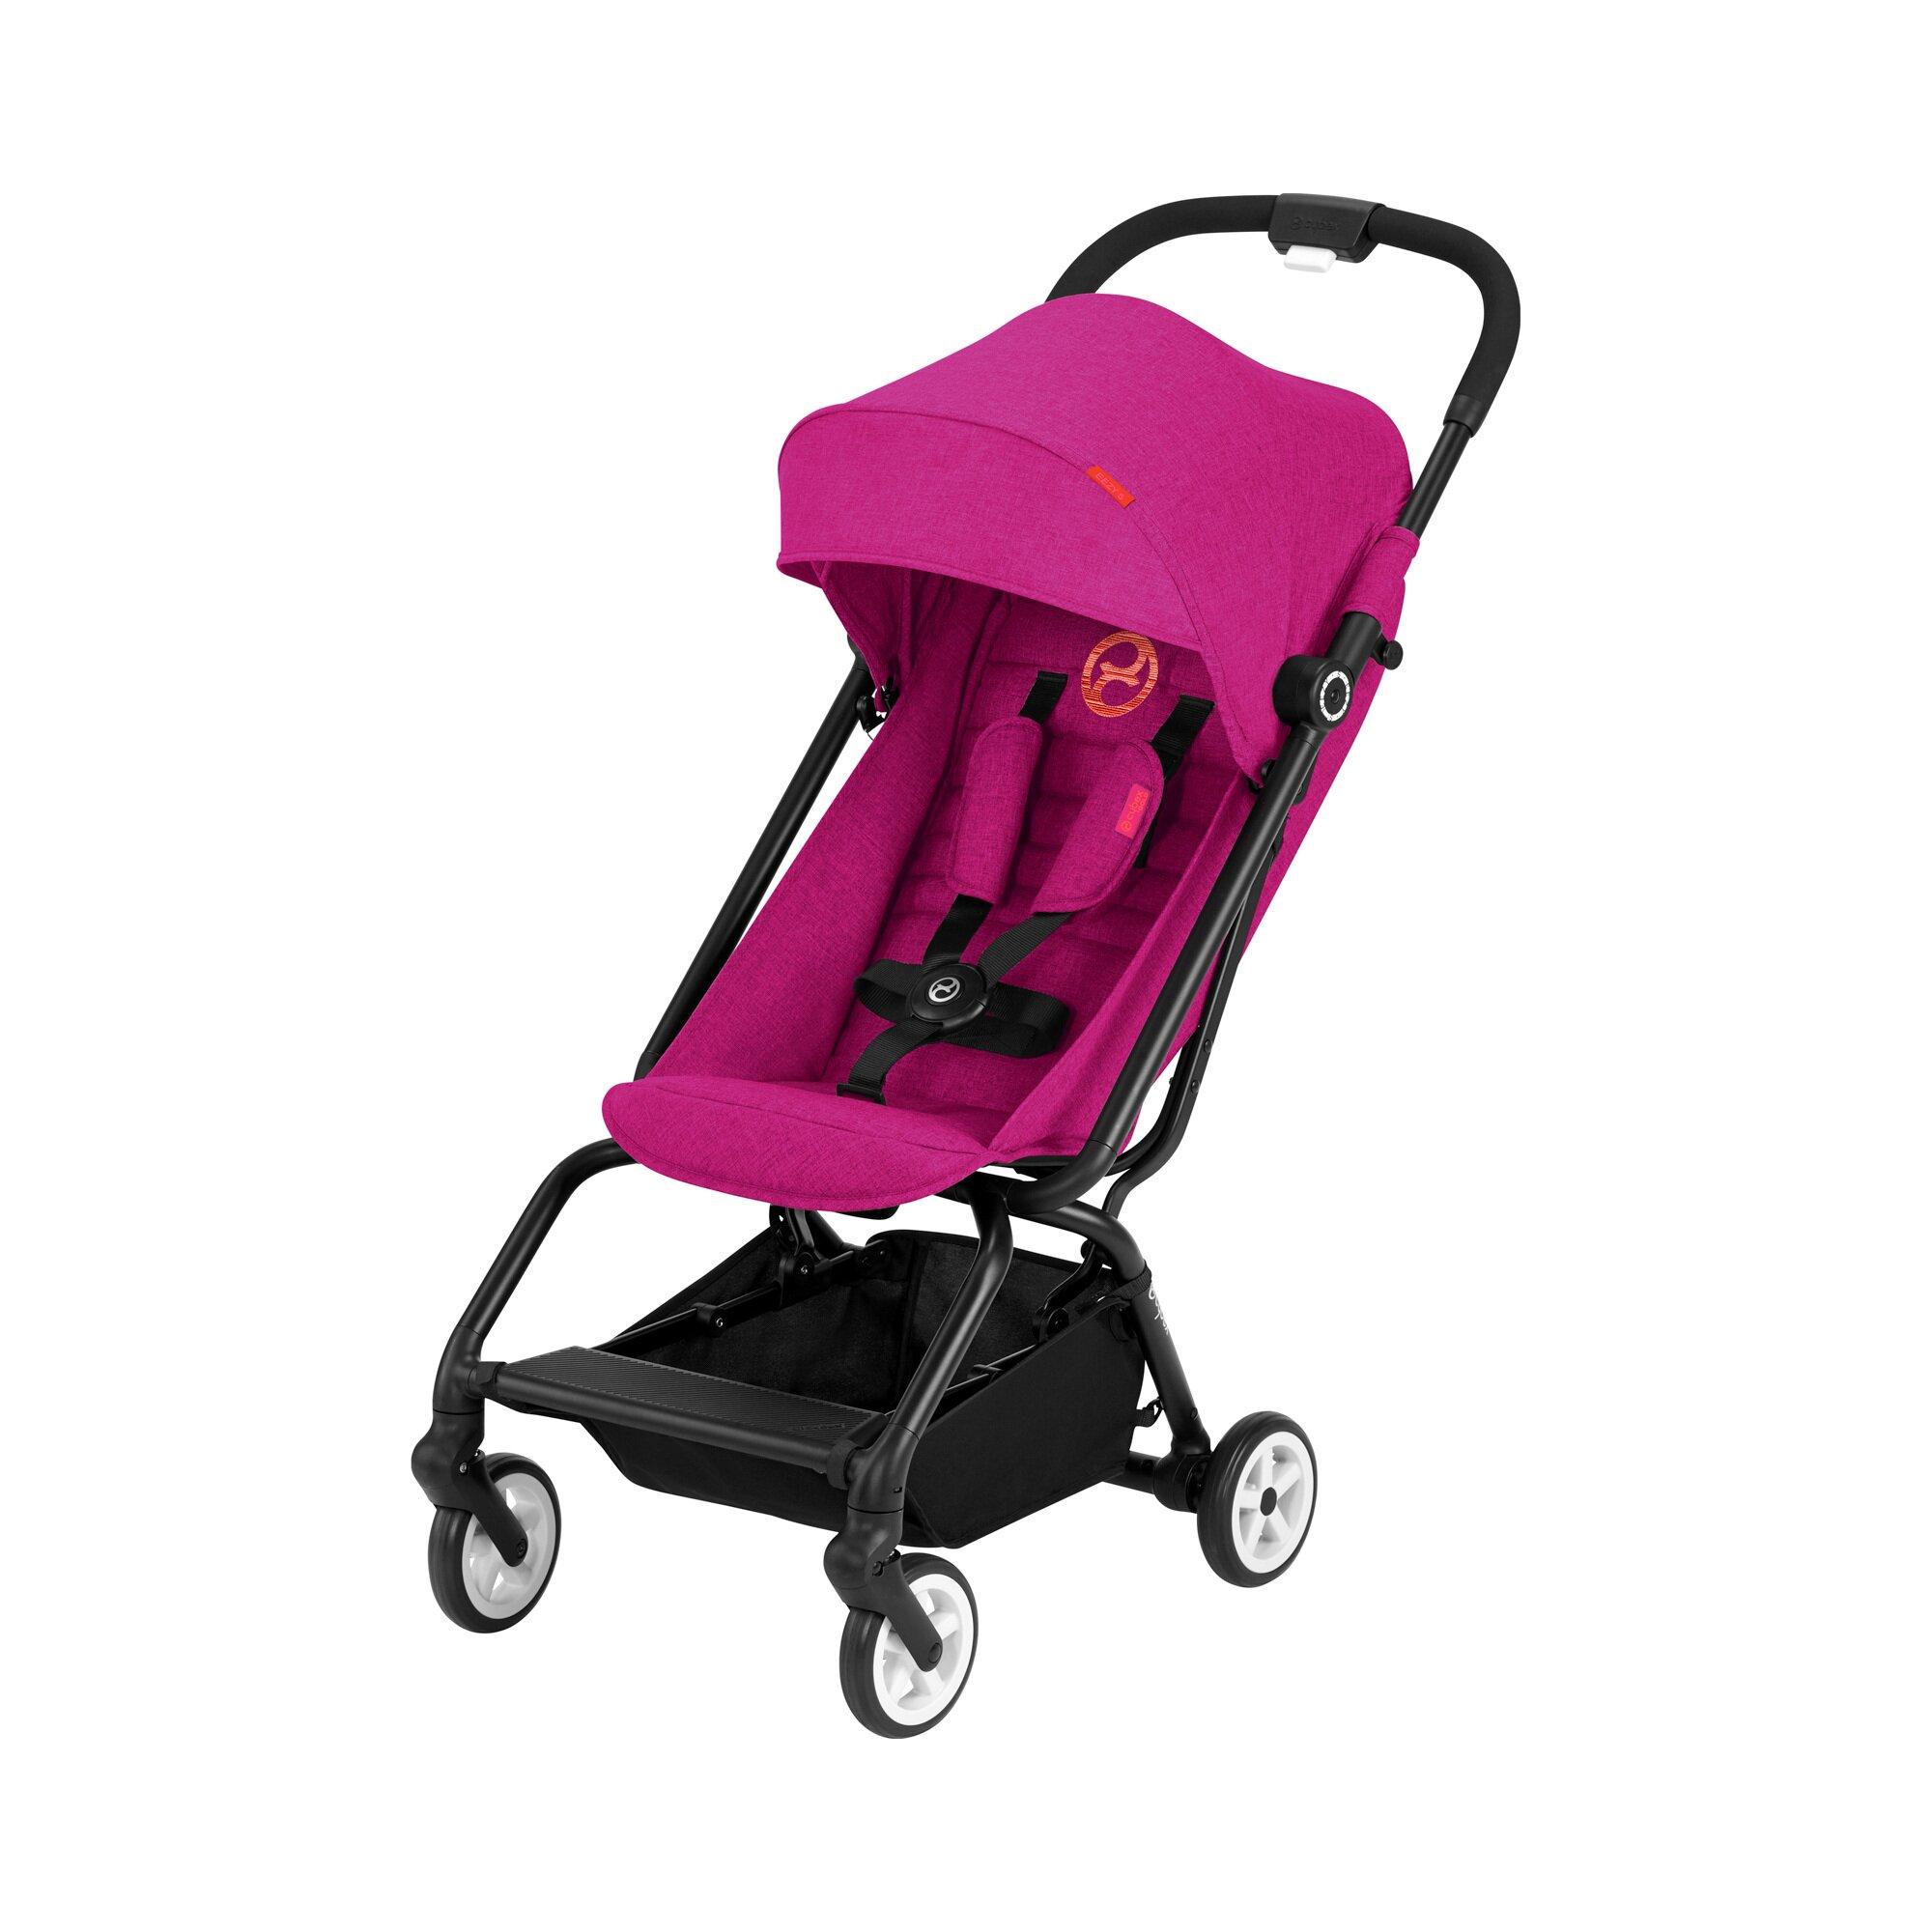 gold-eezy-s-buggy-mit-liegefunktion-design-2018-pink